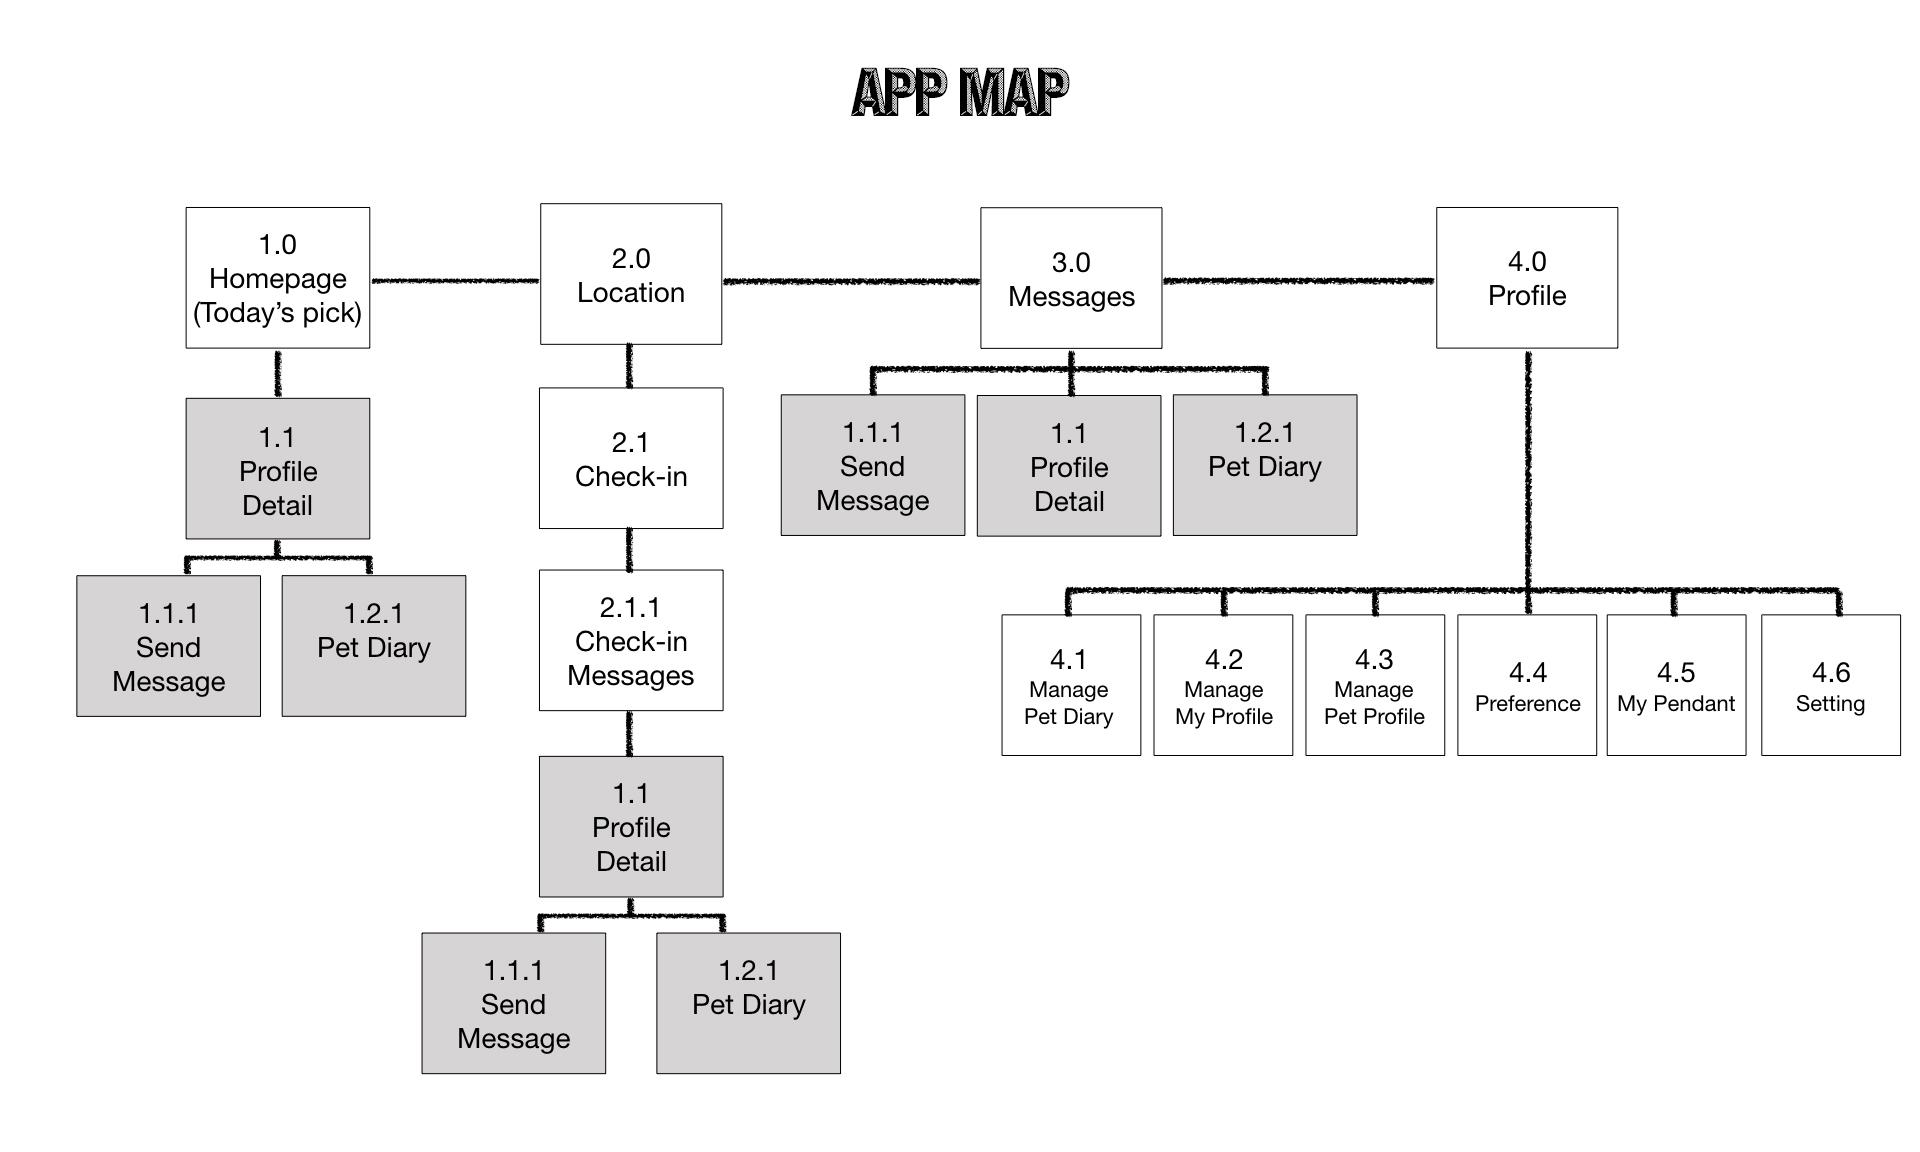 lmah_app_map22.001.jpg